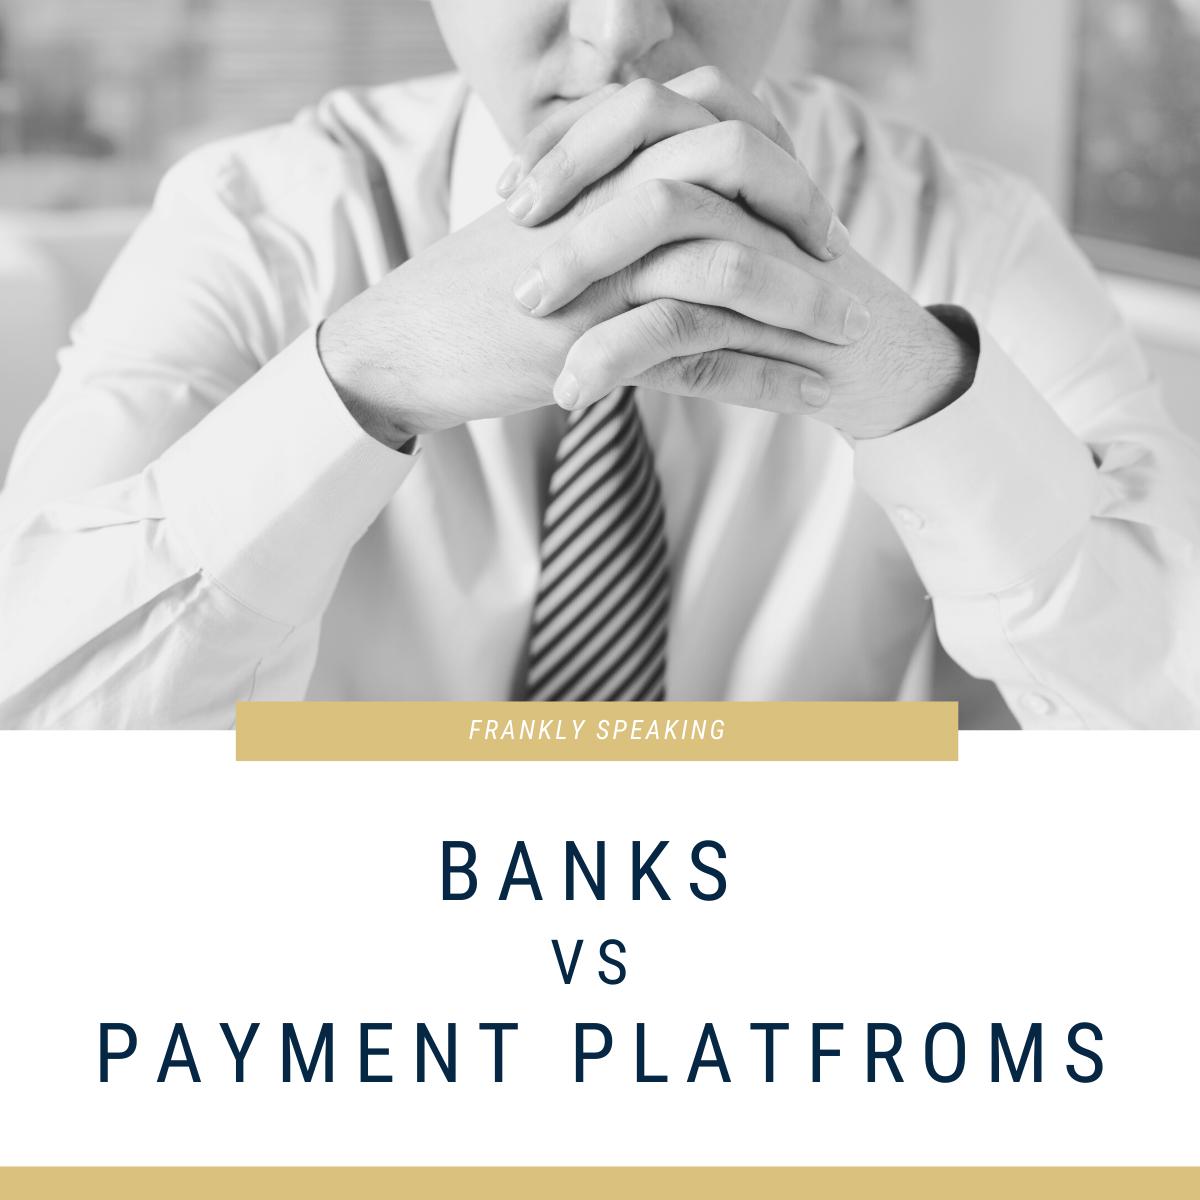 Banks vs Payment Platforms